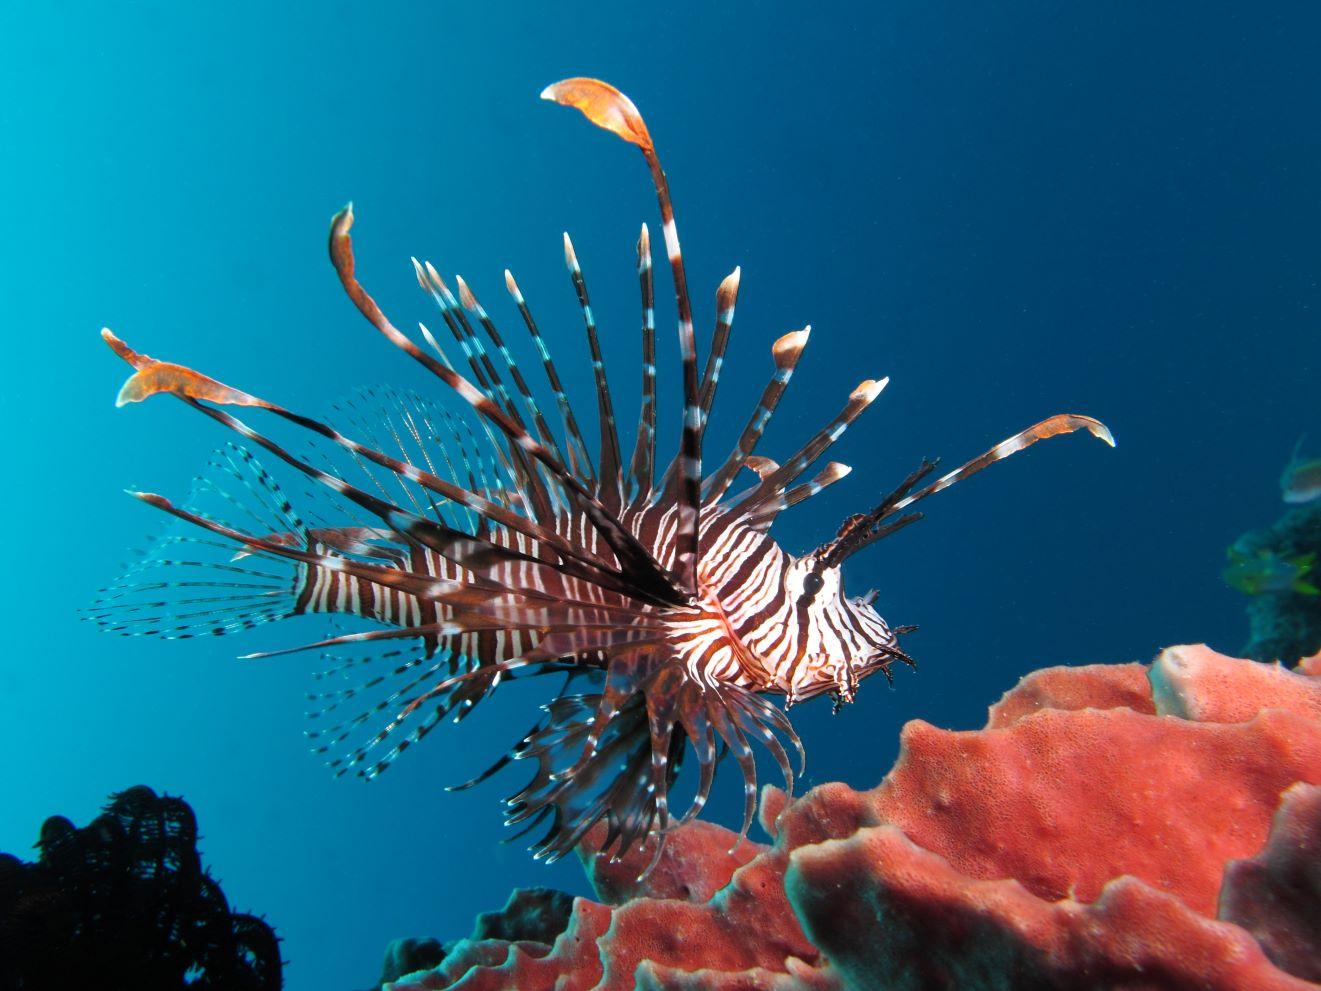 Red lionfish near Gilli Banta Island1 - Lionfish ear-bones reveal a more mobile invasion